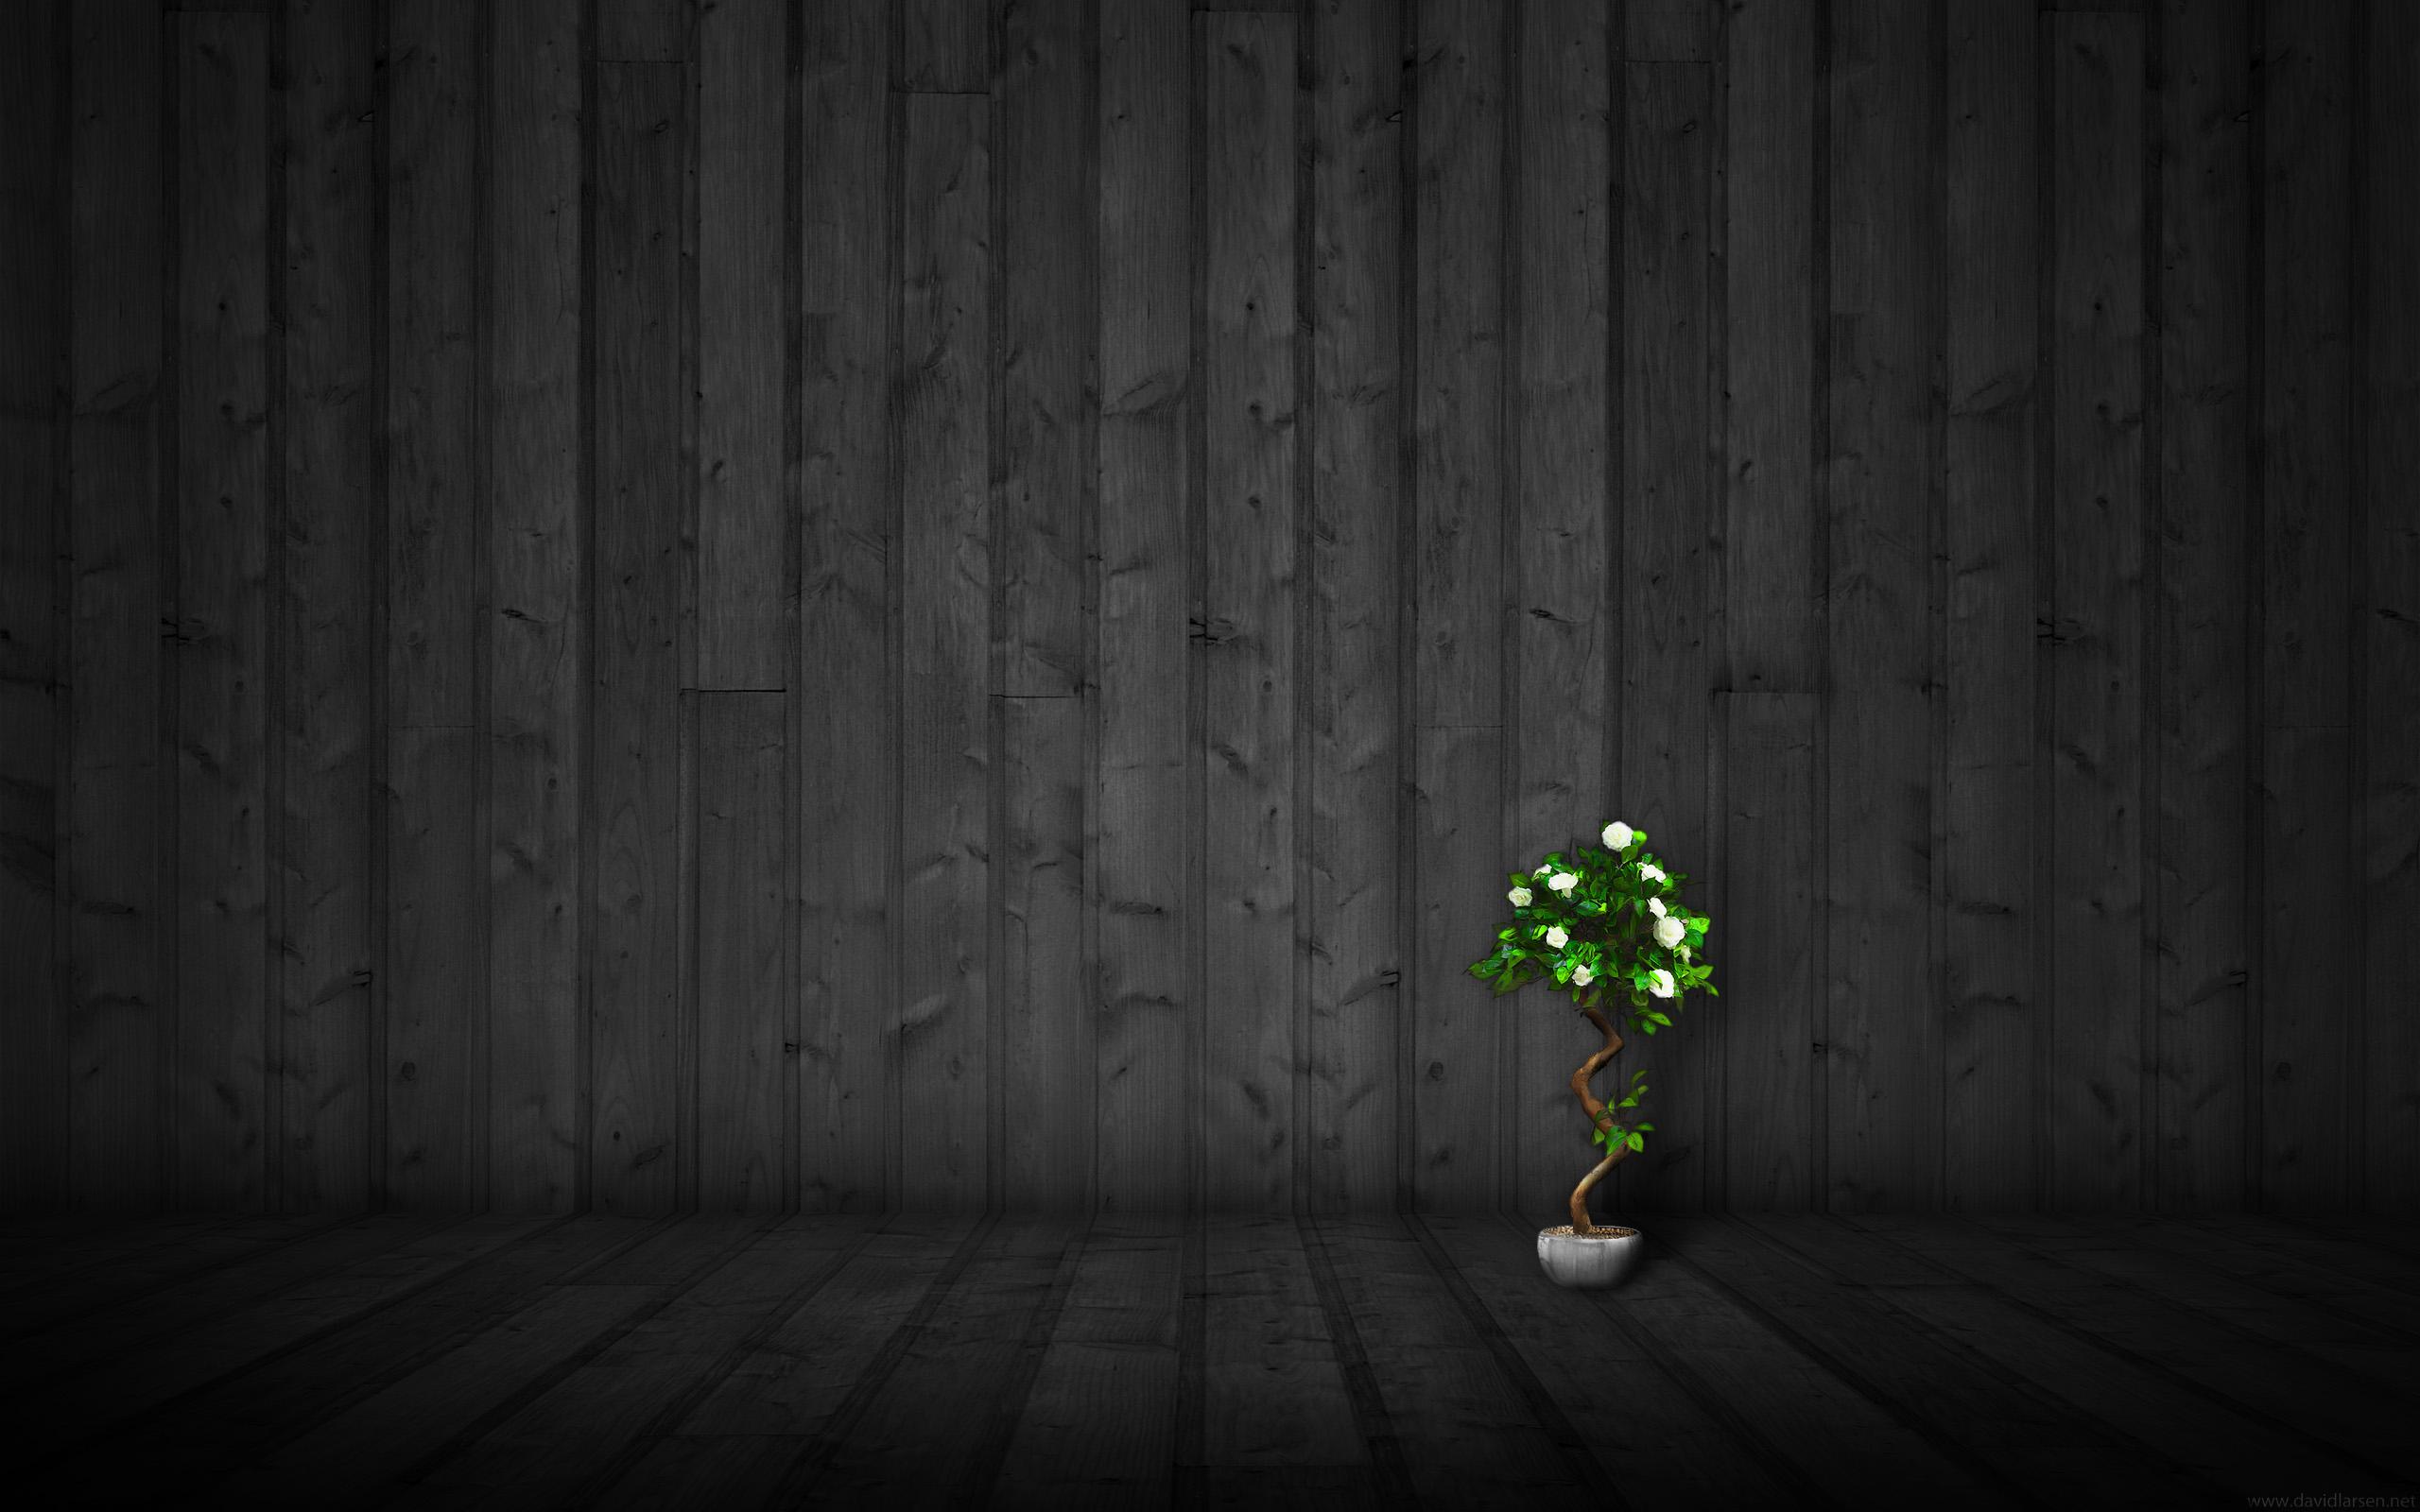 Dark Wood 2 HD Wallpaper Theme Bin   Customization HD Wallpapers 2560x1600